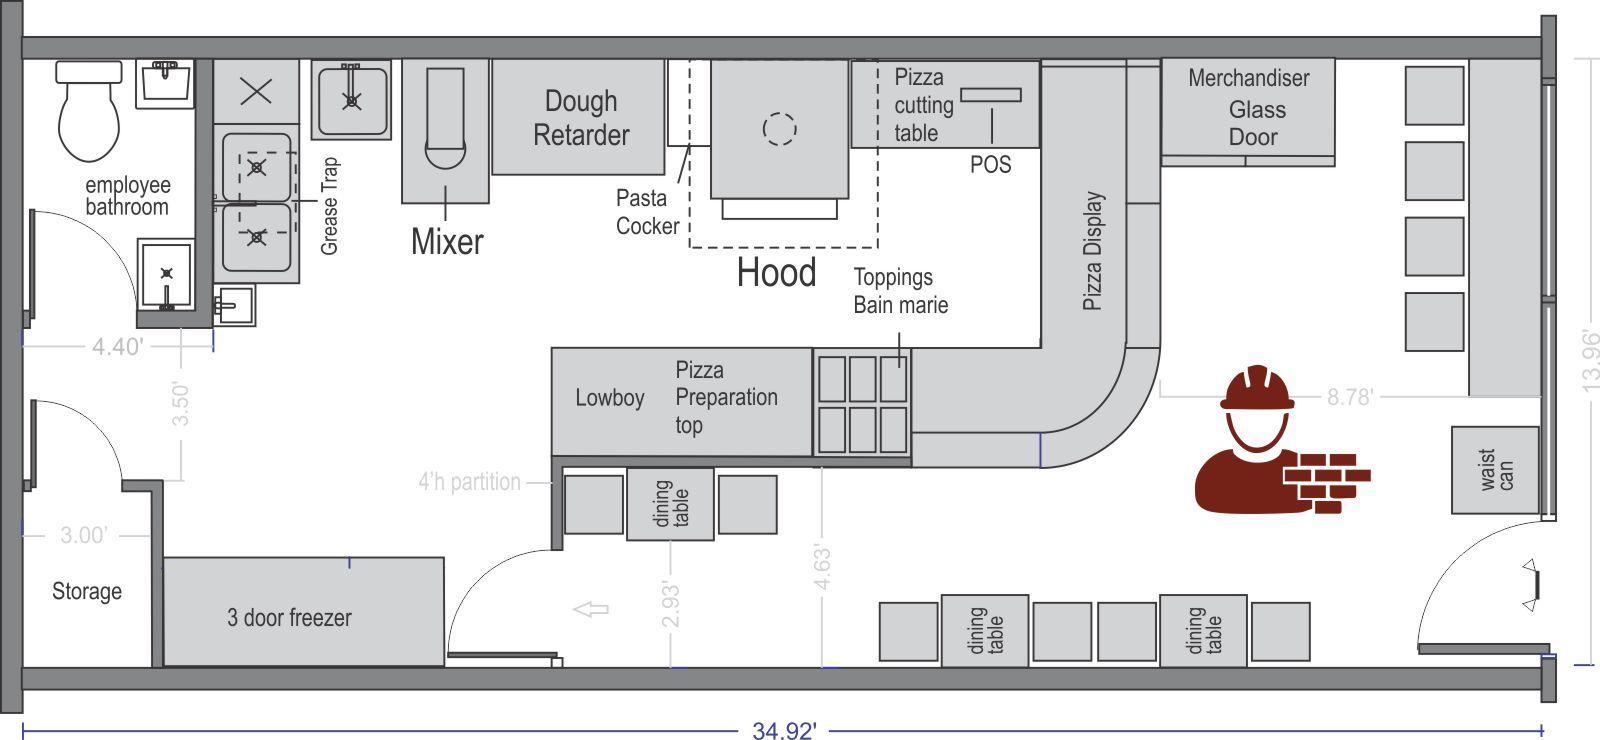 Commercial Kitchen Design Layout Commercial Kitchen Design Commercial Kitchen Design Layout Restaurant Floor Plan